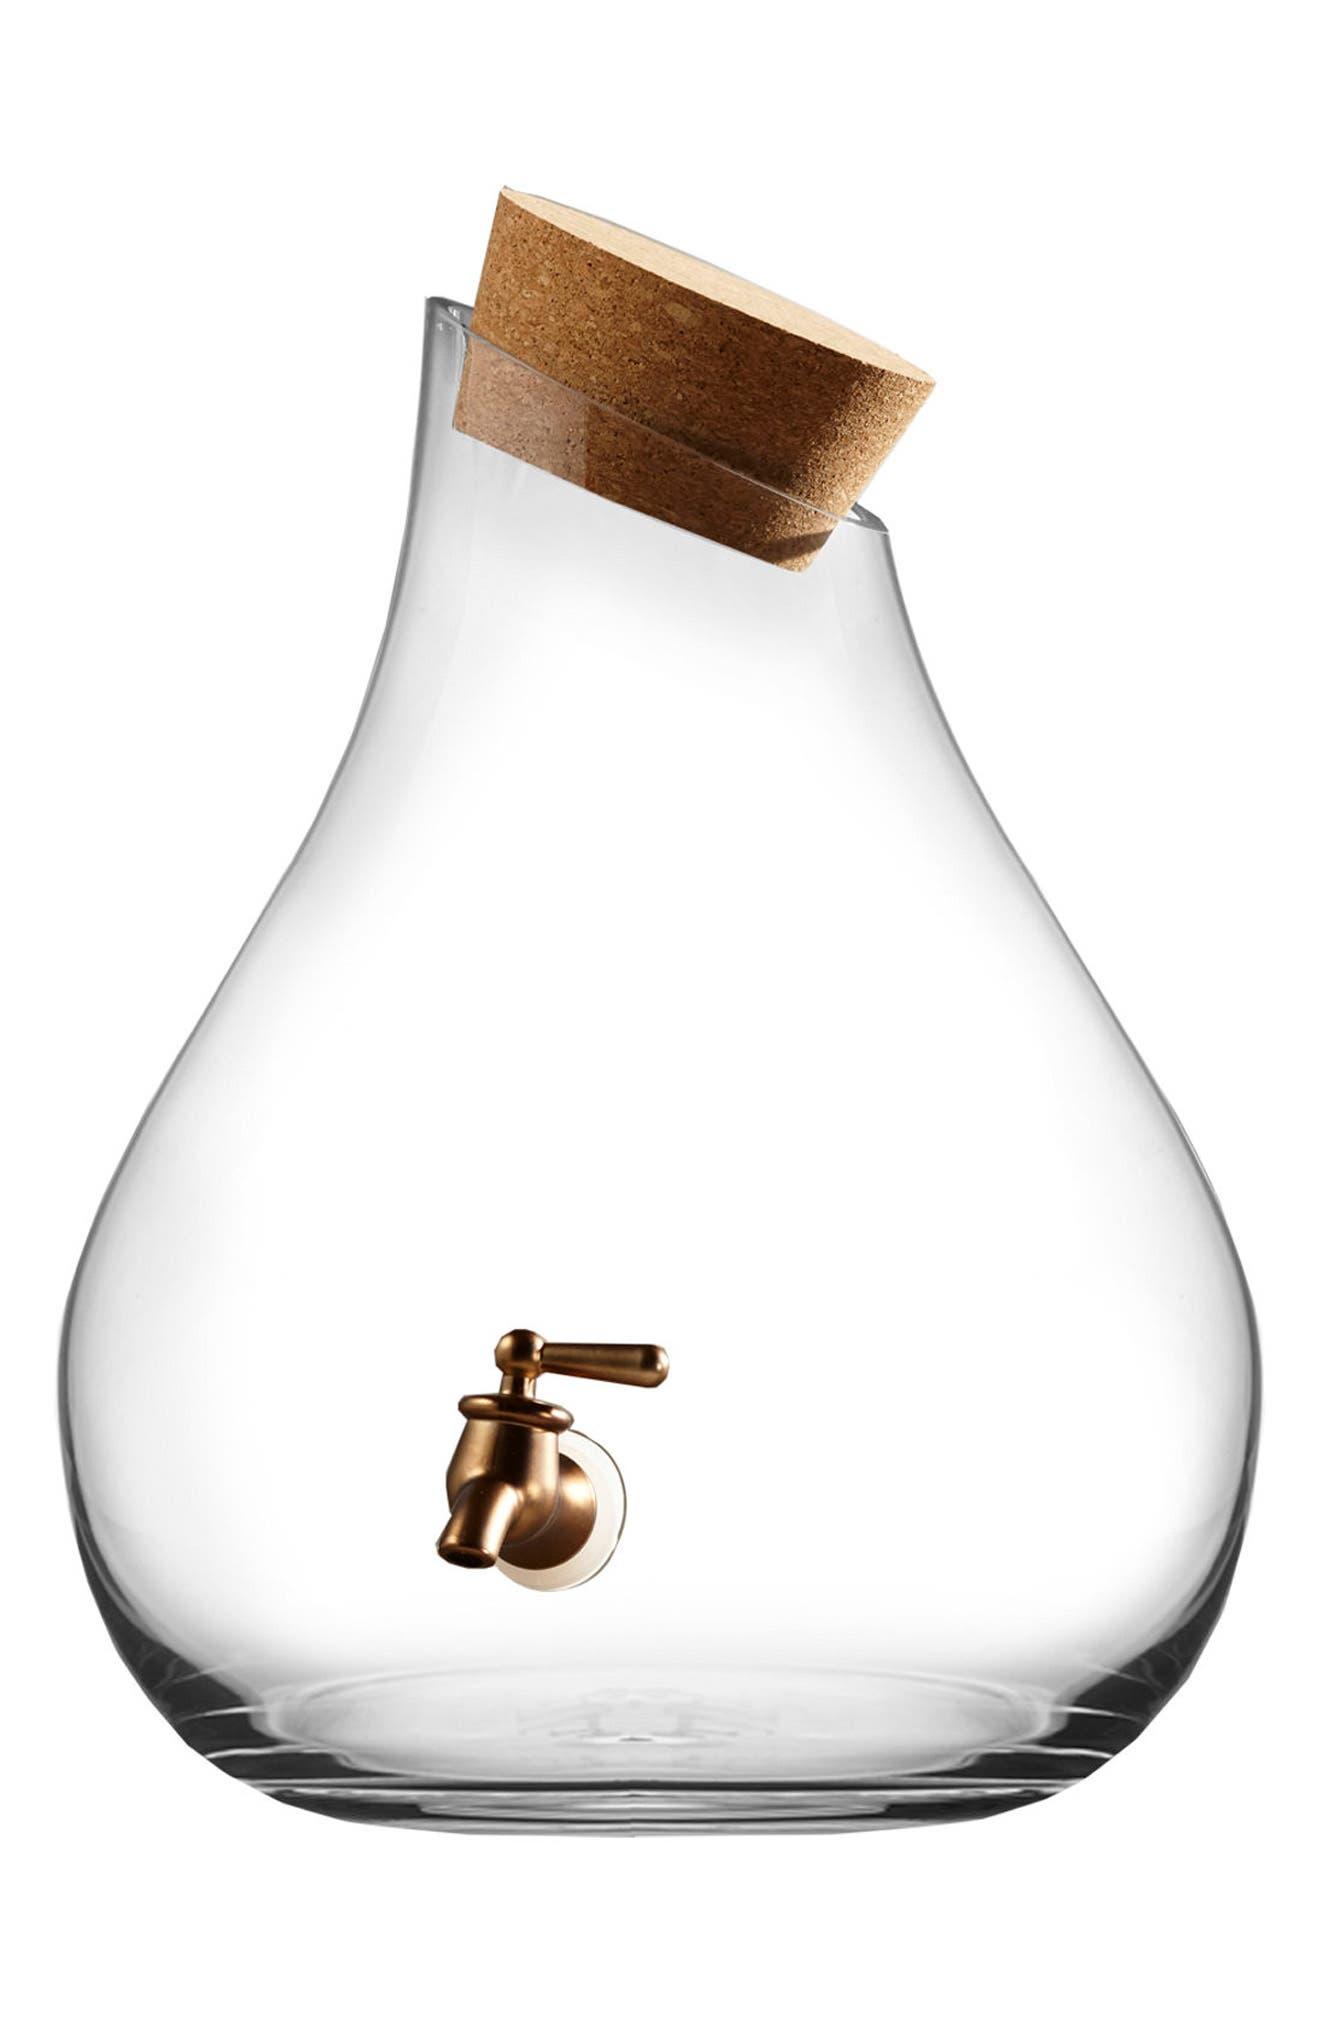 Main Image - American Atelier 2.5-Gallon Beverage Dispenser